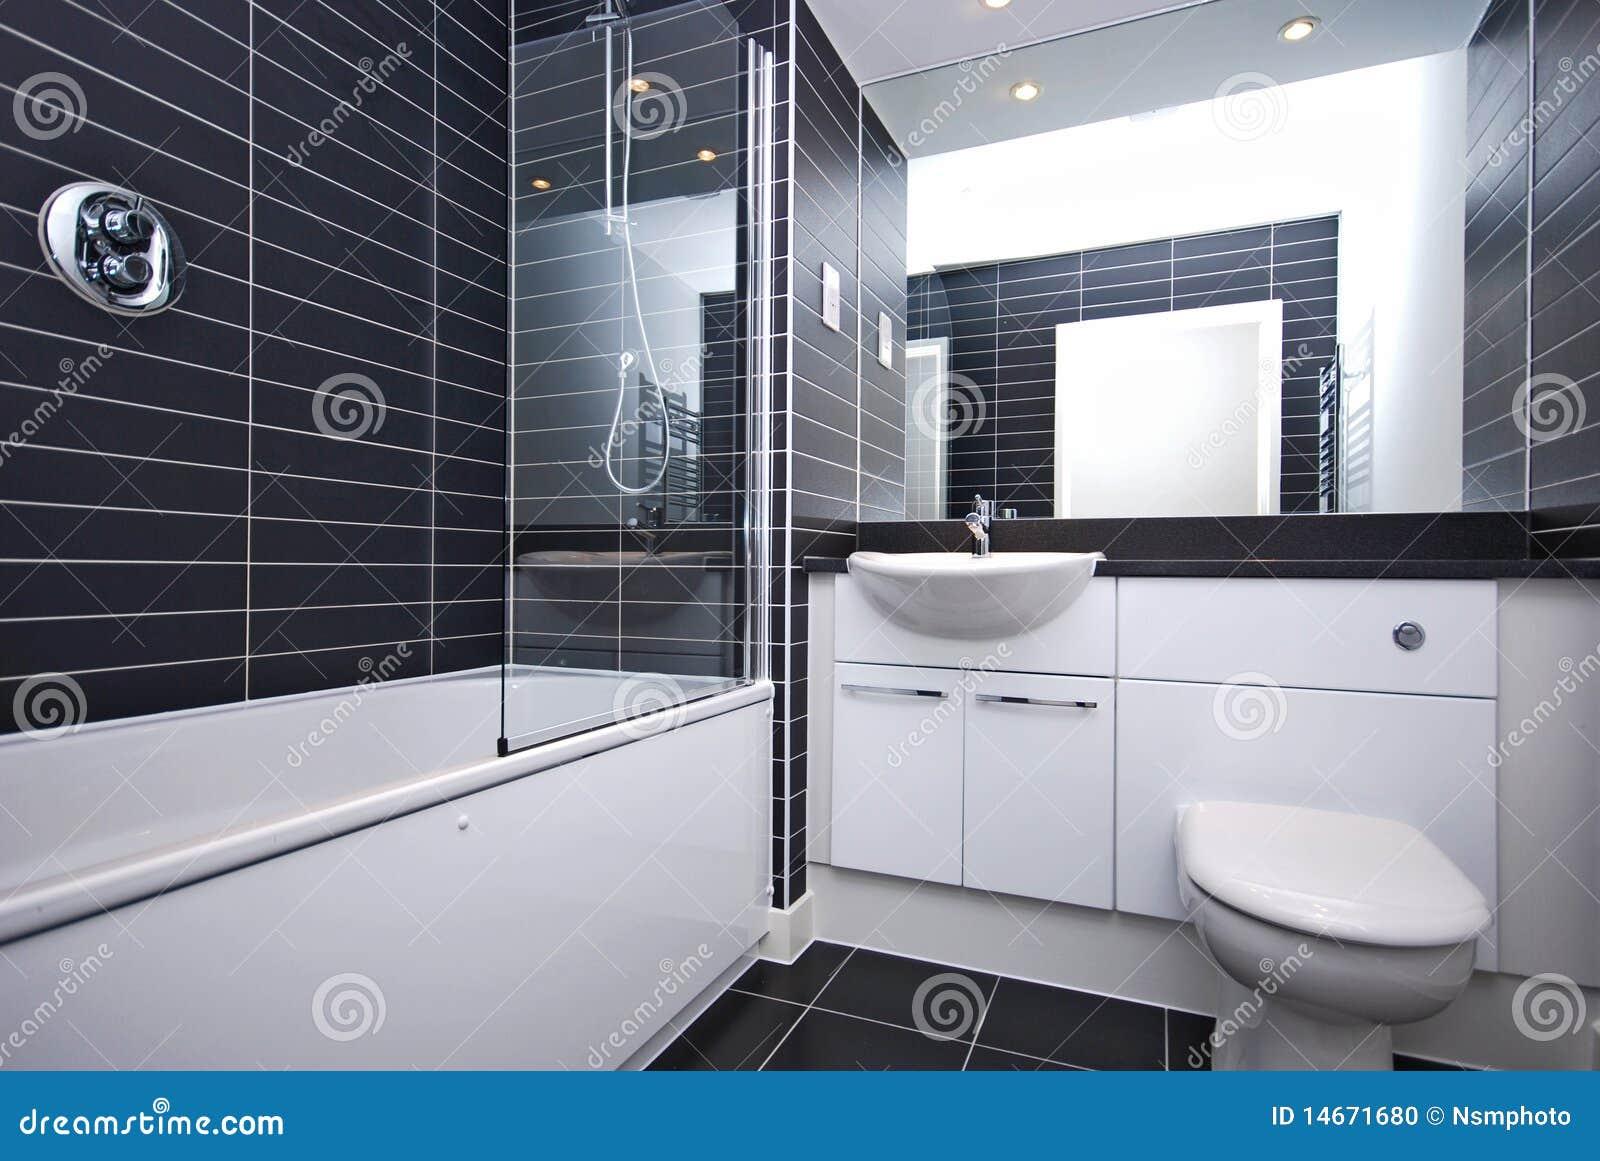 Baños Nuevos Modernos:Black and White Modern Bathroom